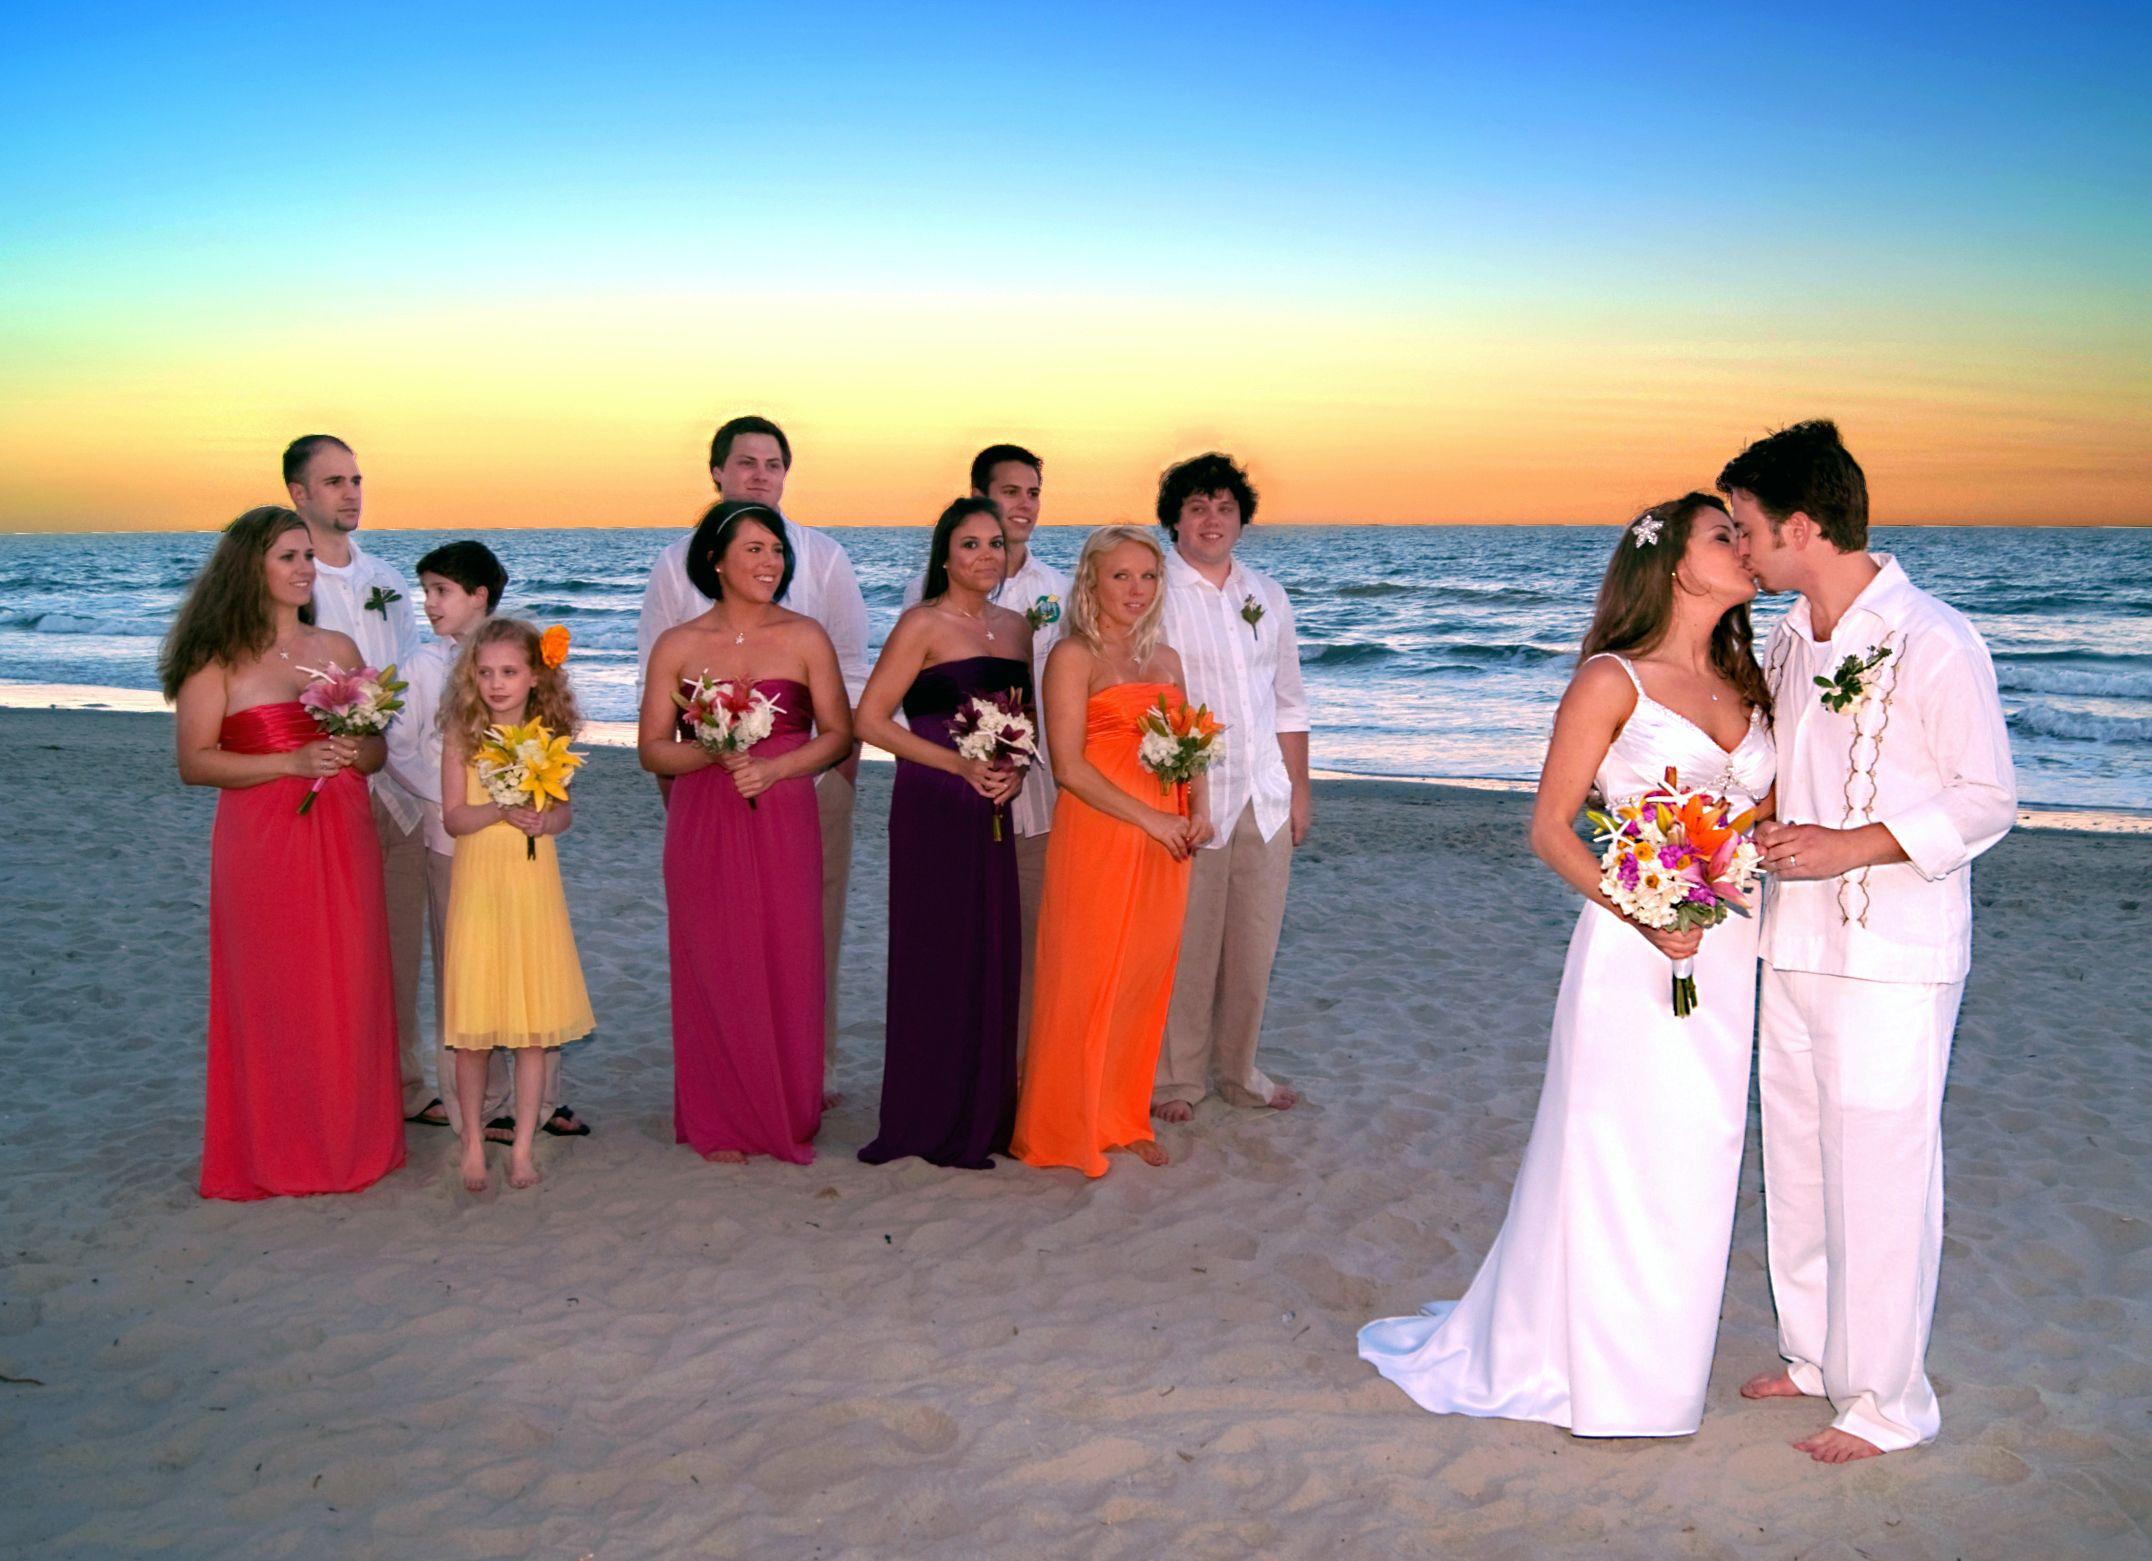 Beach wedding, bridal party, sunset colors Sunset beach